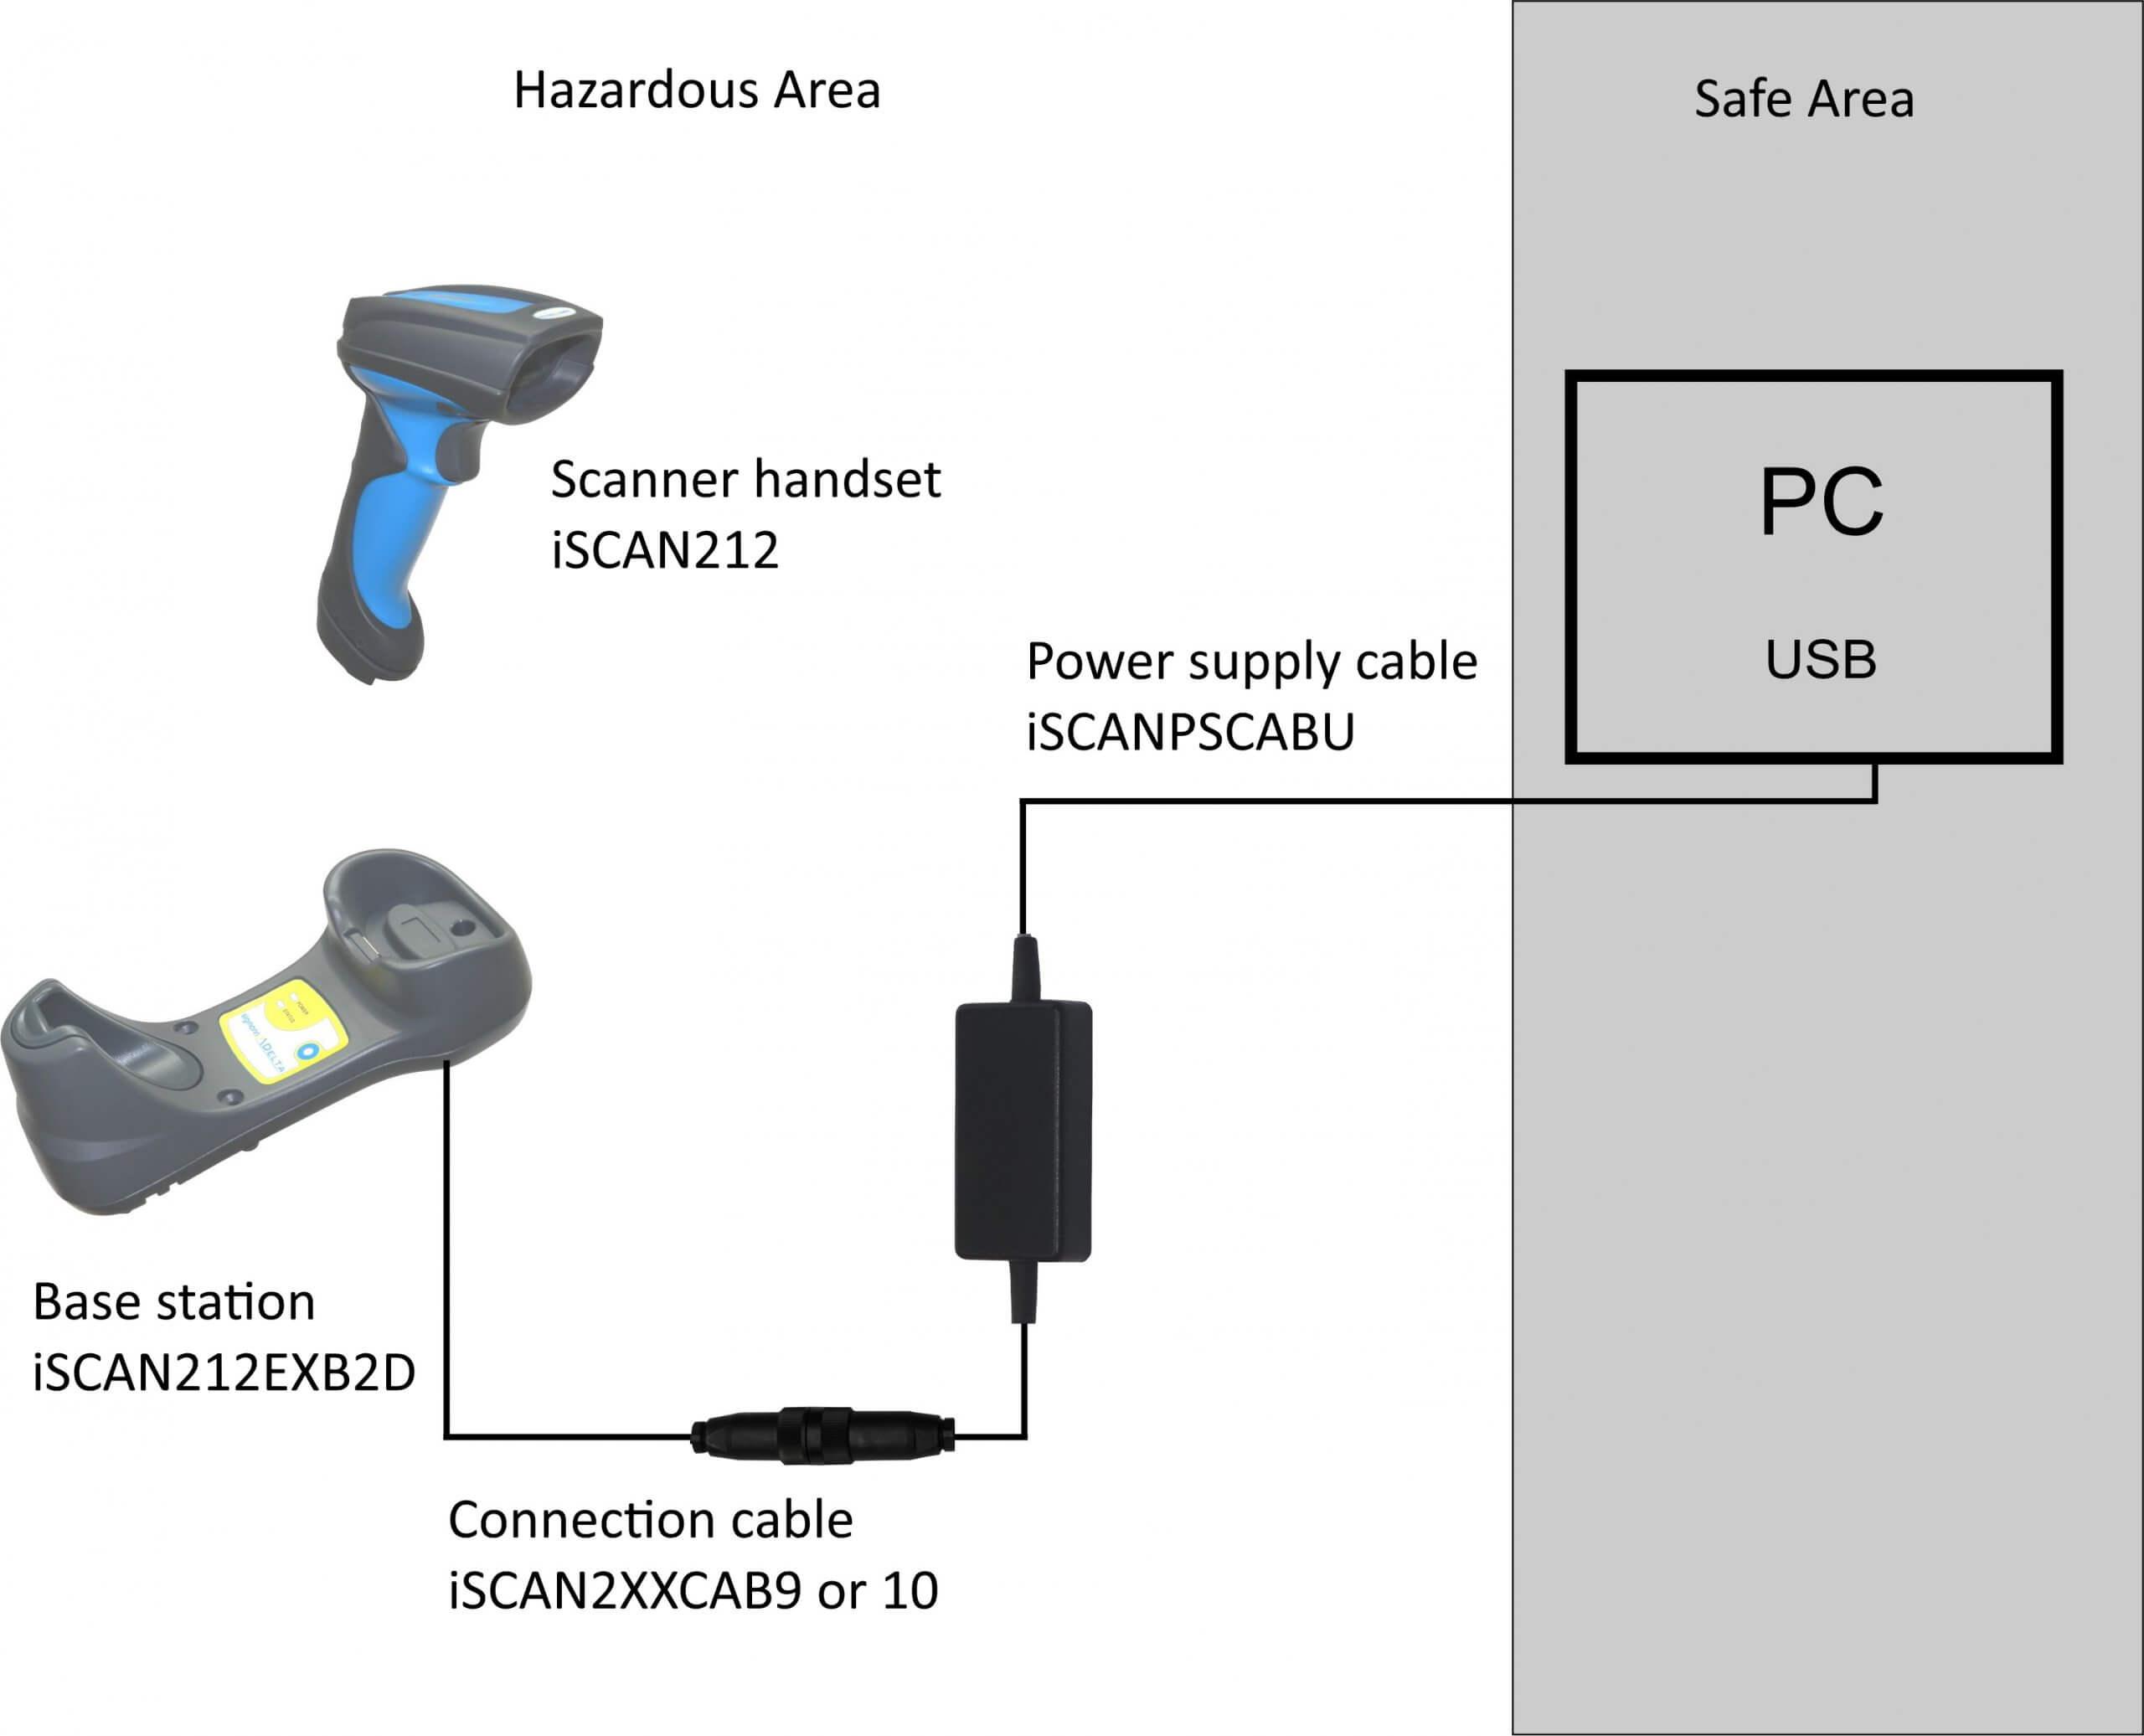 Bluetooth barcode scanner in hazardous area